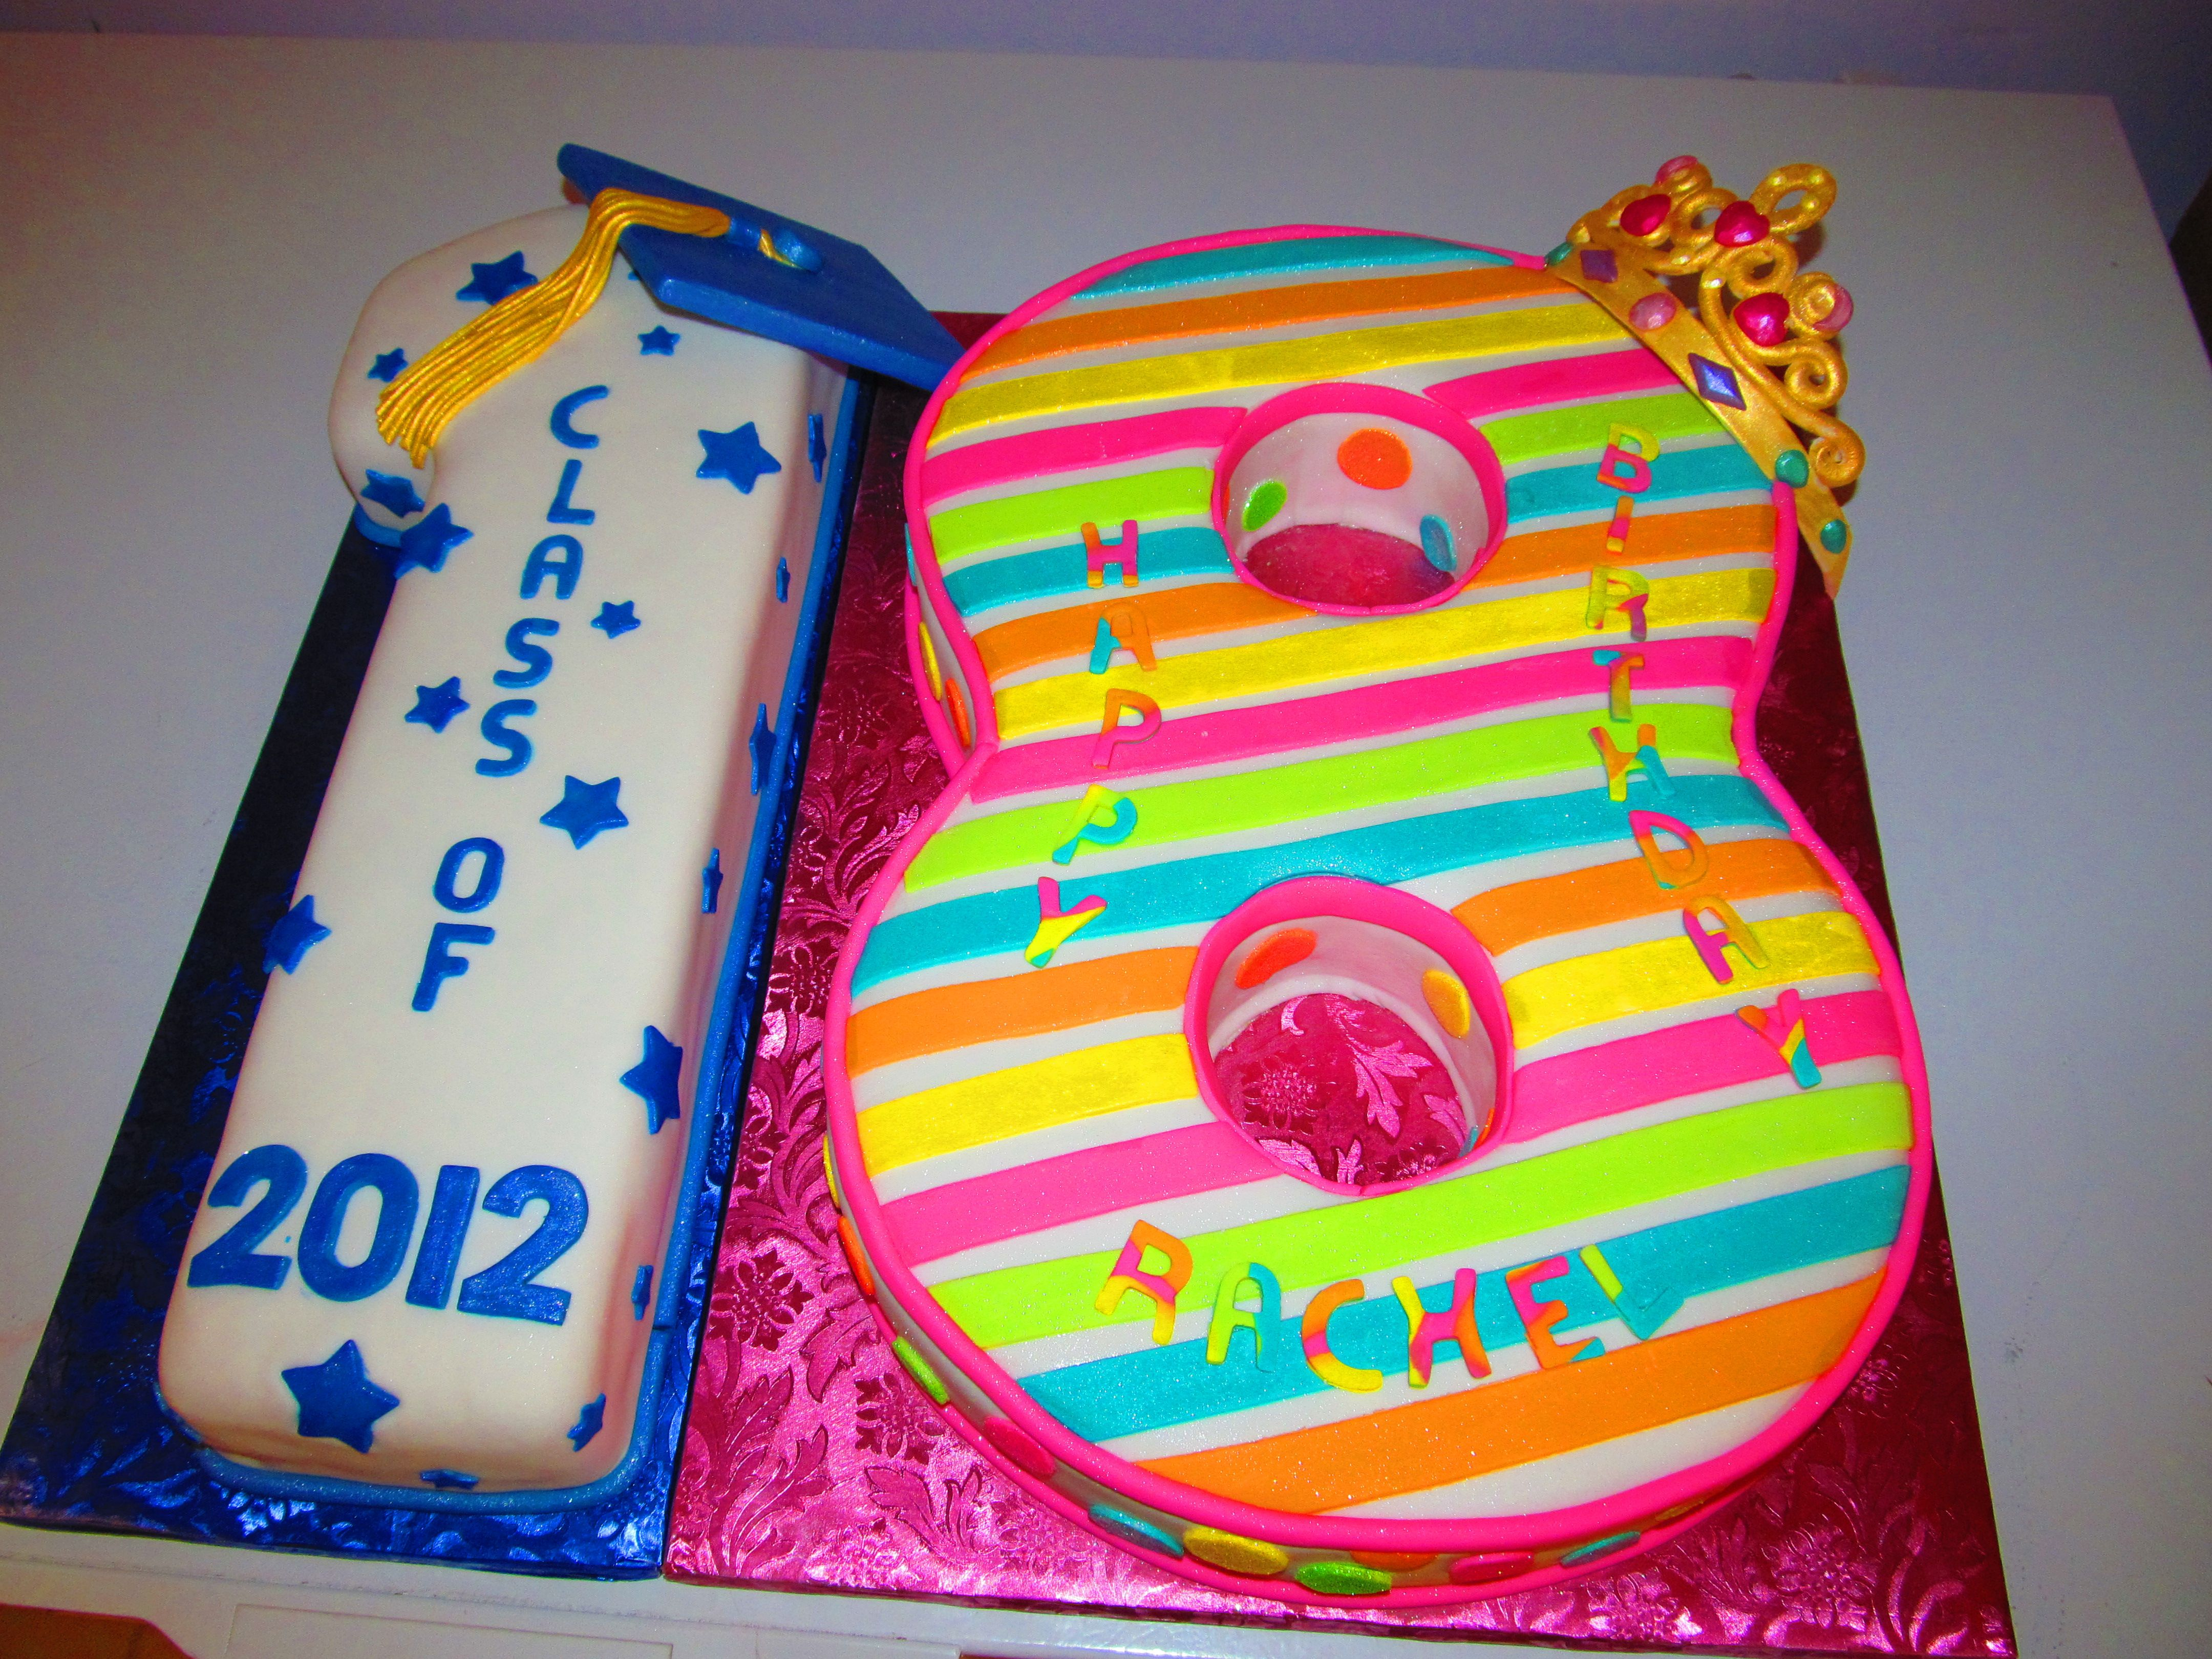 Surprising Graduation Birthday Cake 18Th Birthday And Graduation Cake I Personalised Birthday Cards Beptaeletsinfo